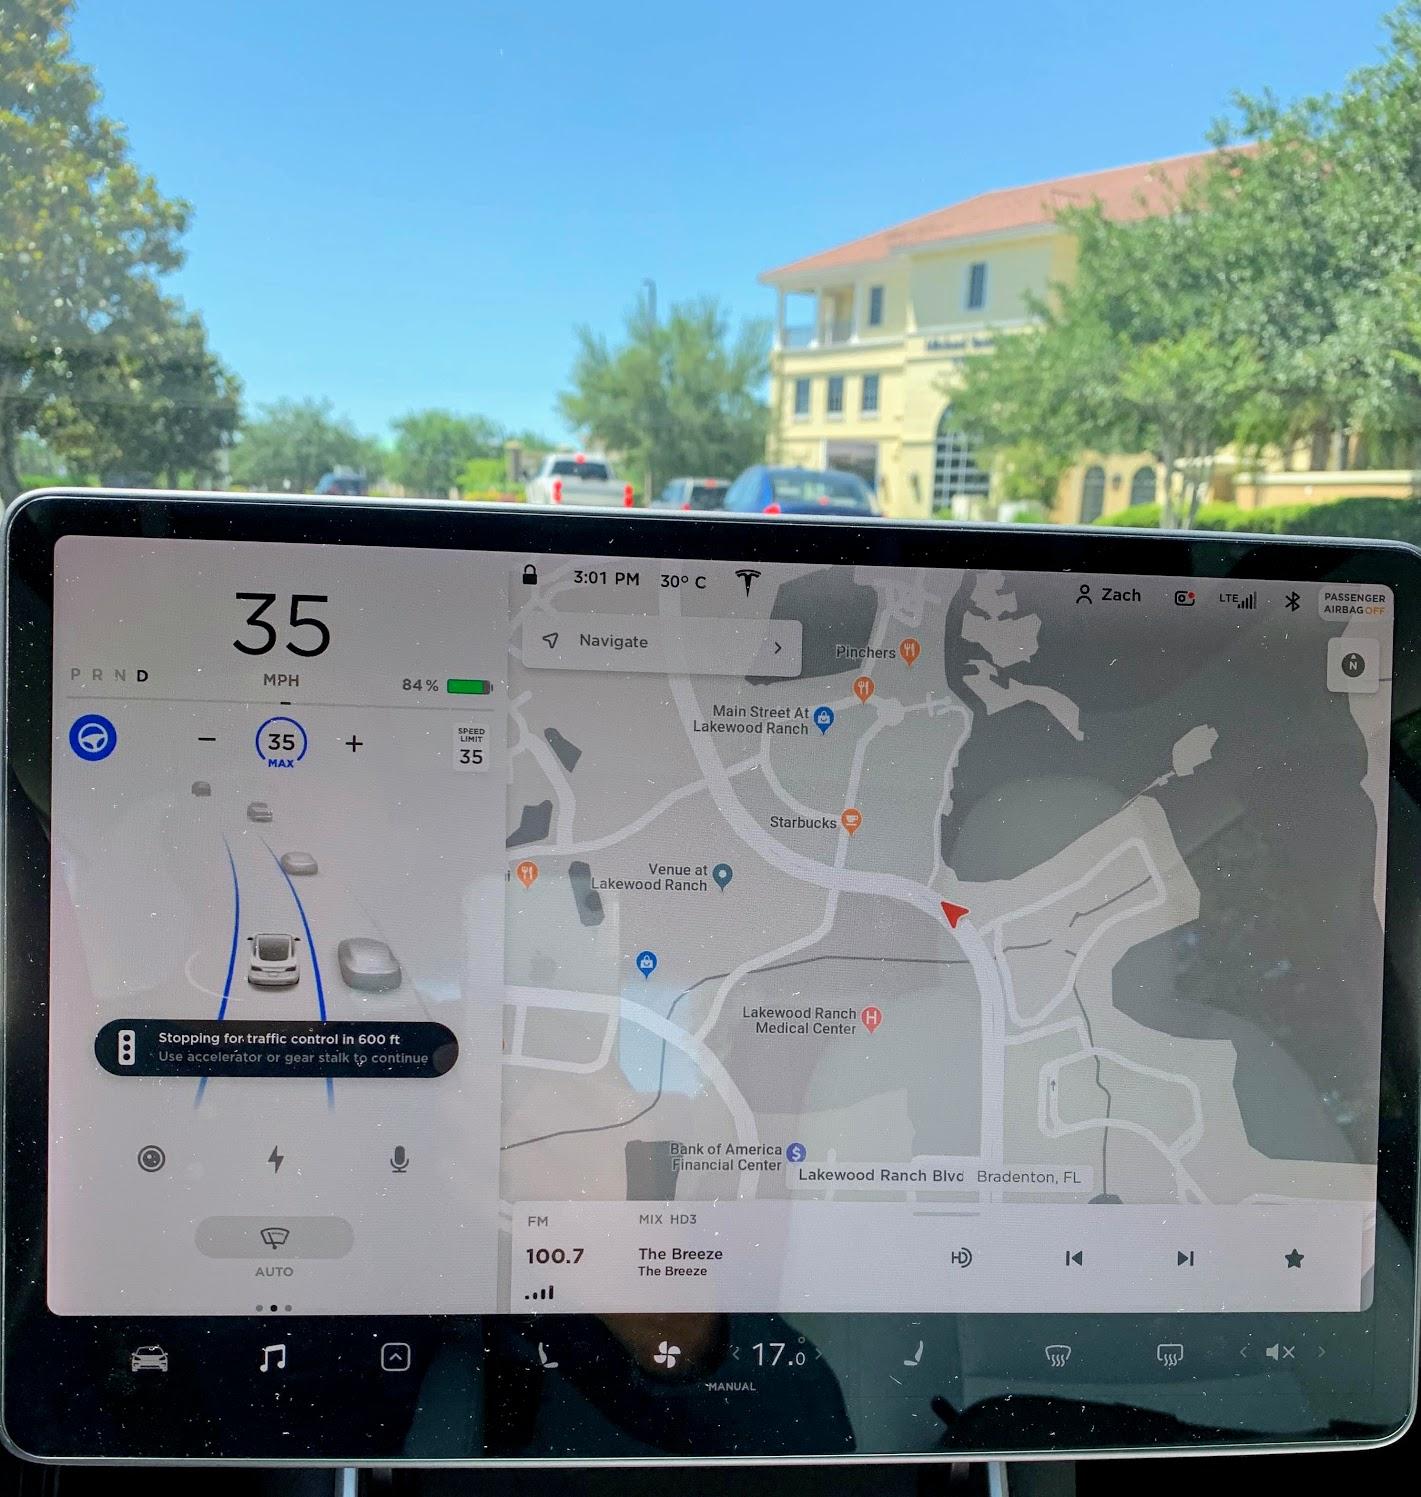 10 Ideas About What Happens After Tesla Releases Next Autopilot Update